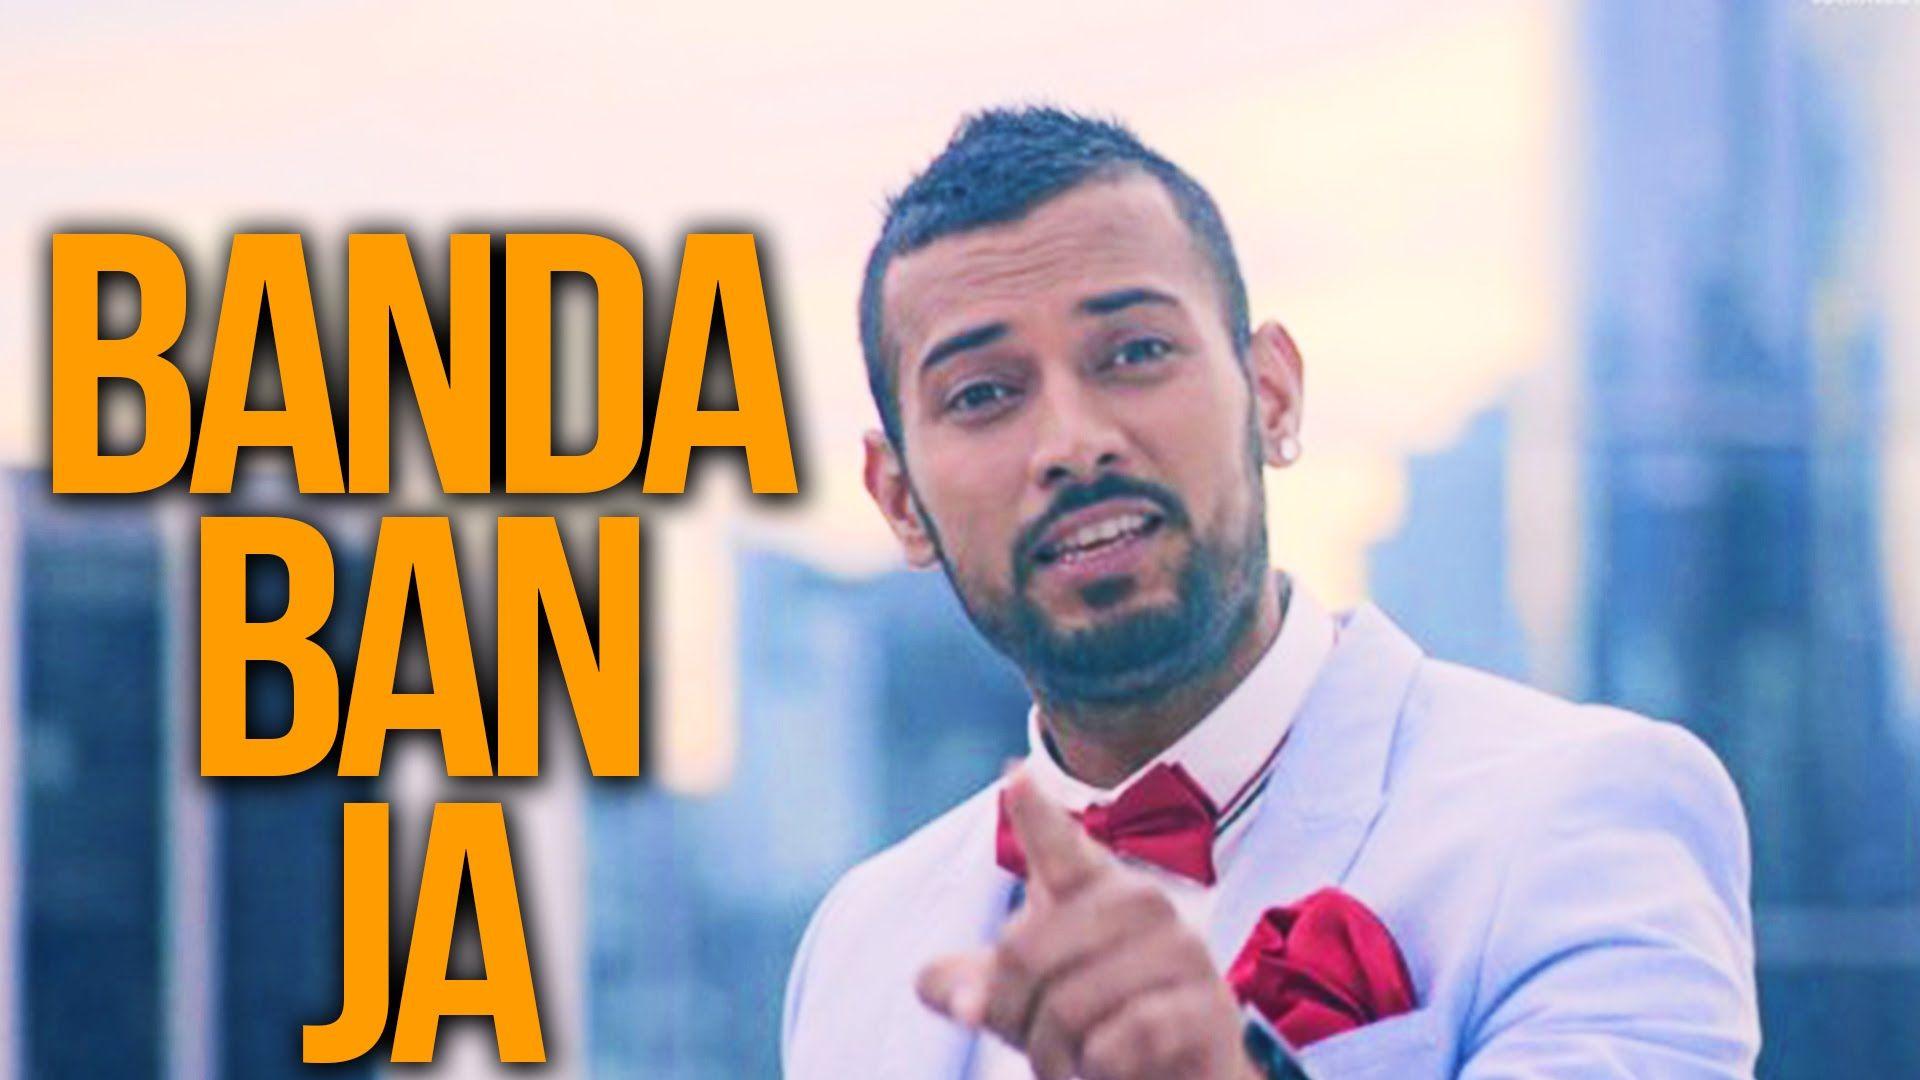 Garry Sandhu Banda Ban Ja Official Video 2014 Romantic Songs Songs Banda